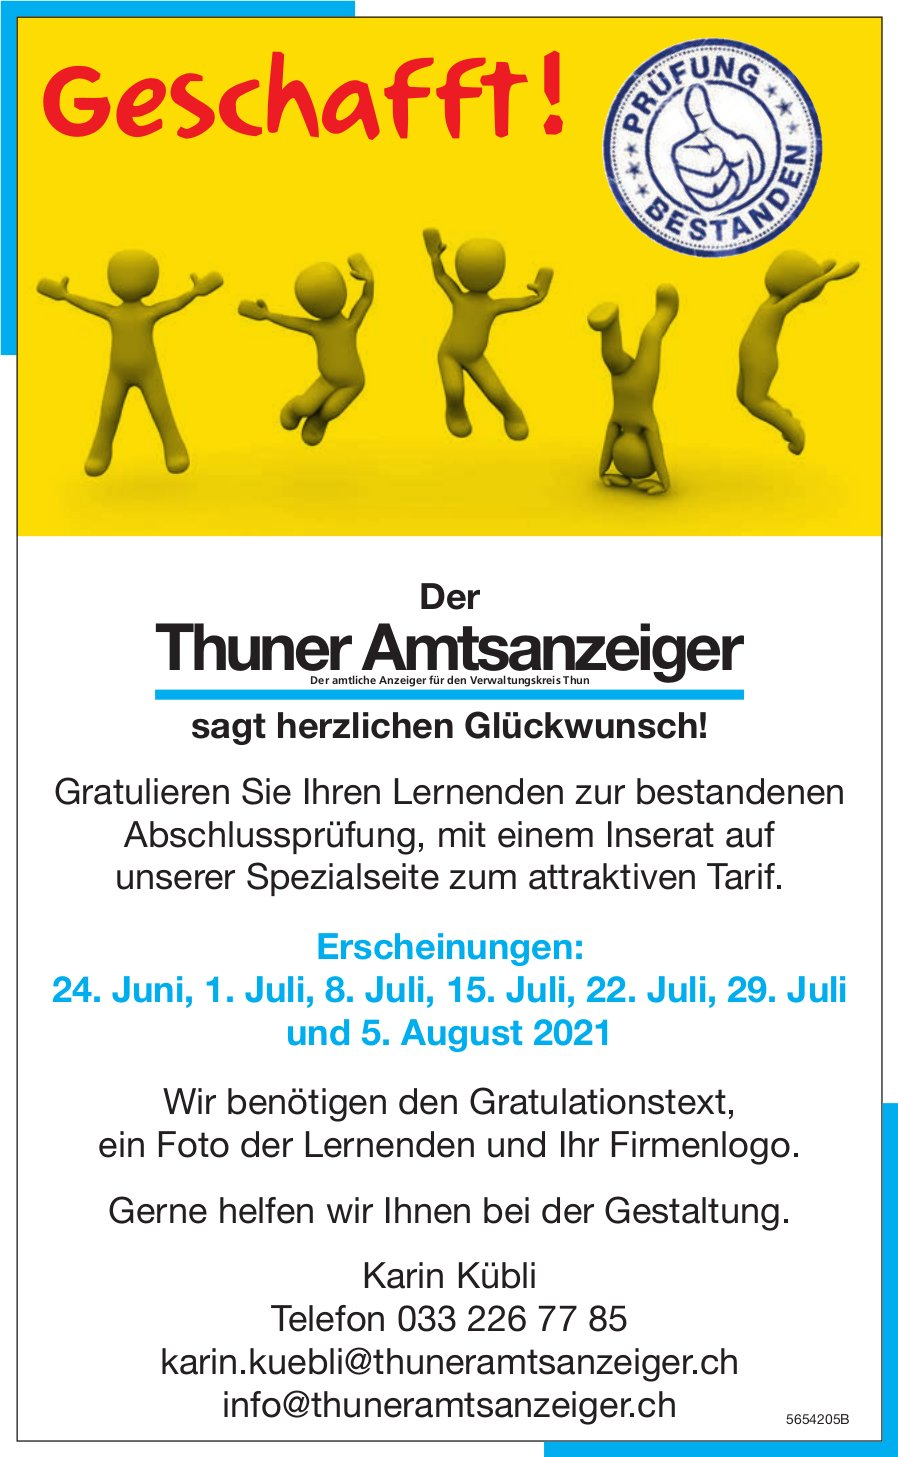 Geschafft ! Der Thuner Amtsanzeiger sagt herzlichen Glückwunsch!